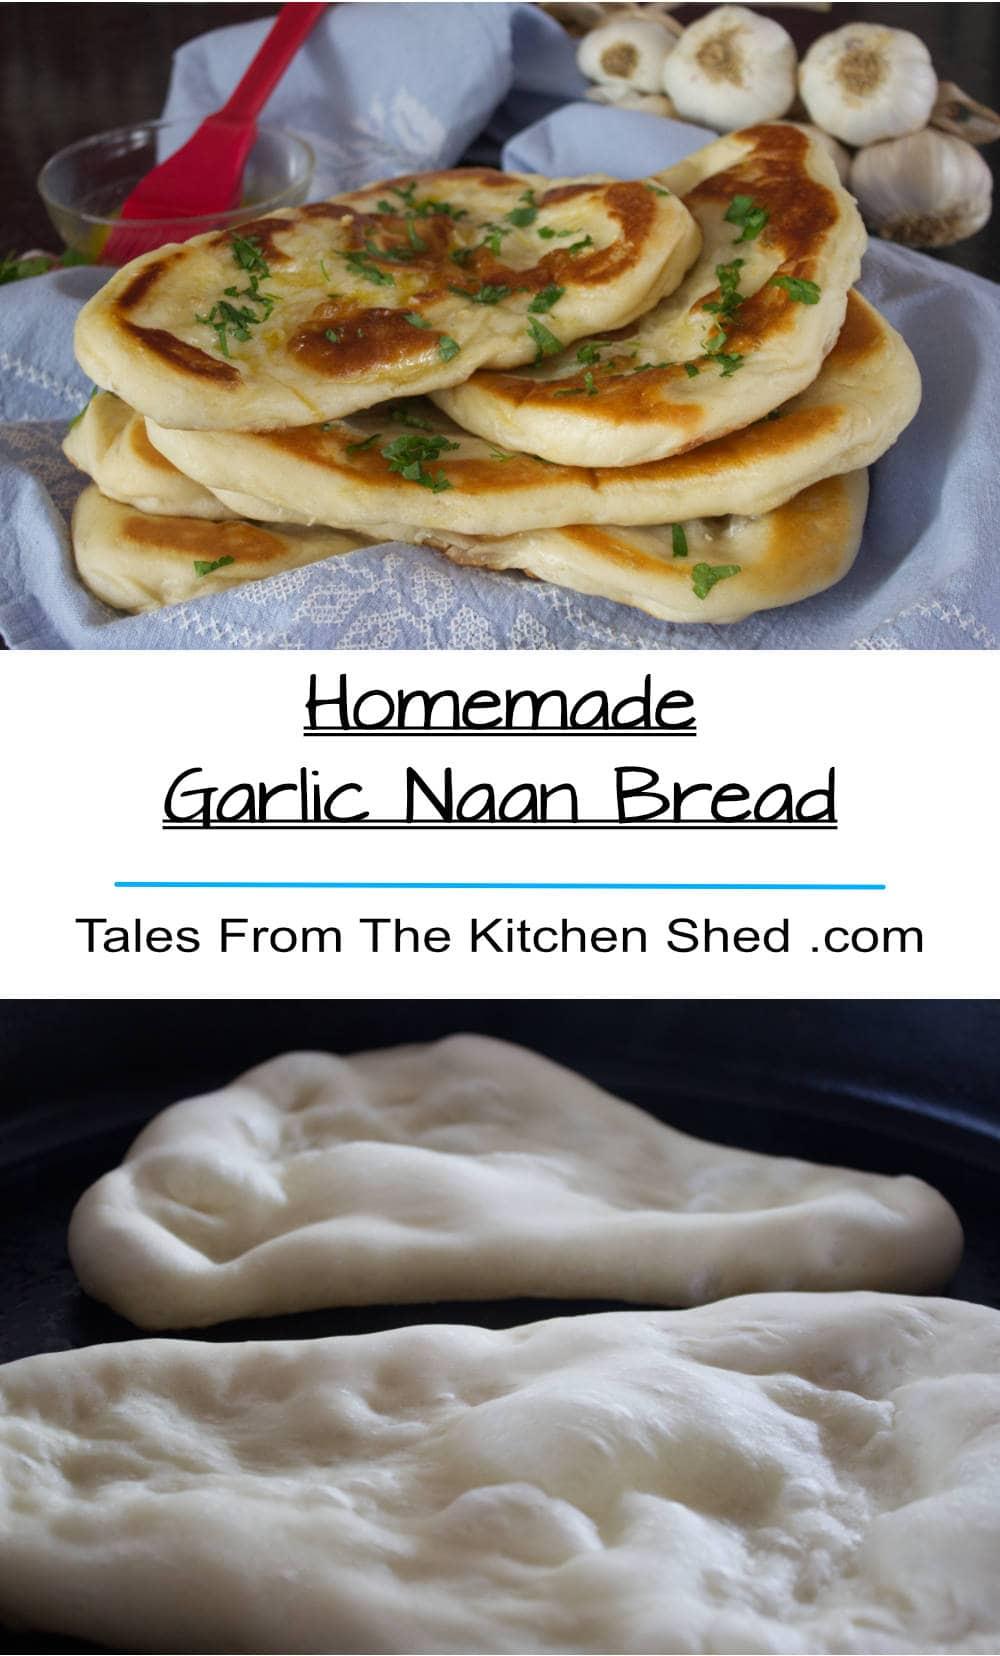 Homemade Garlic Naan Bread oozing with garlic butter on a blue tea towel .